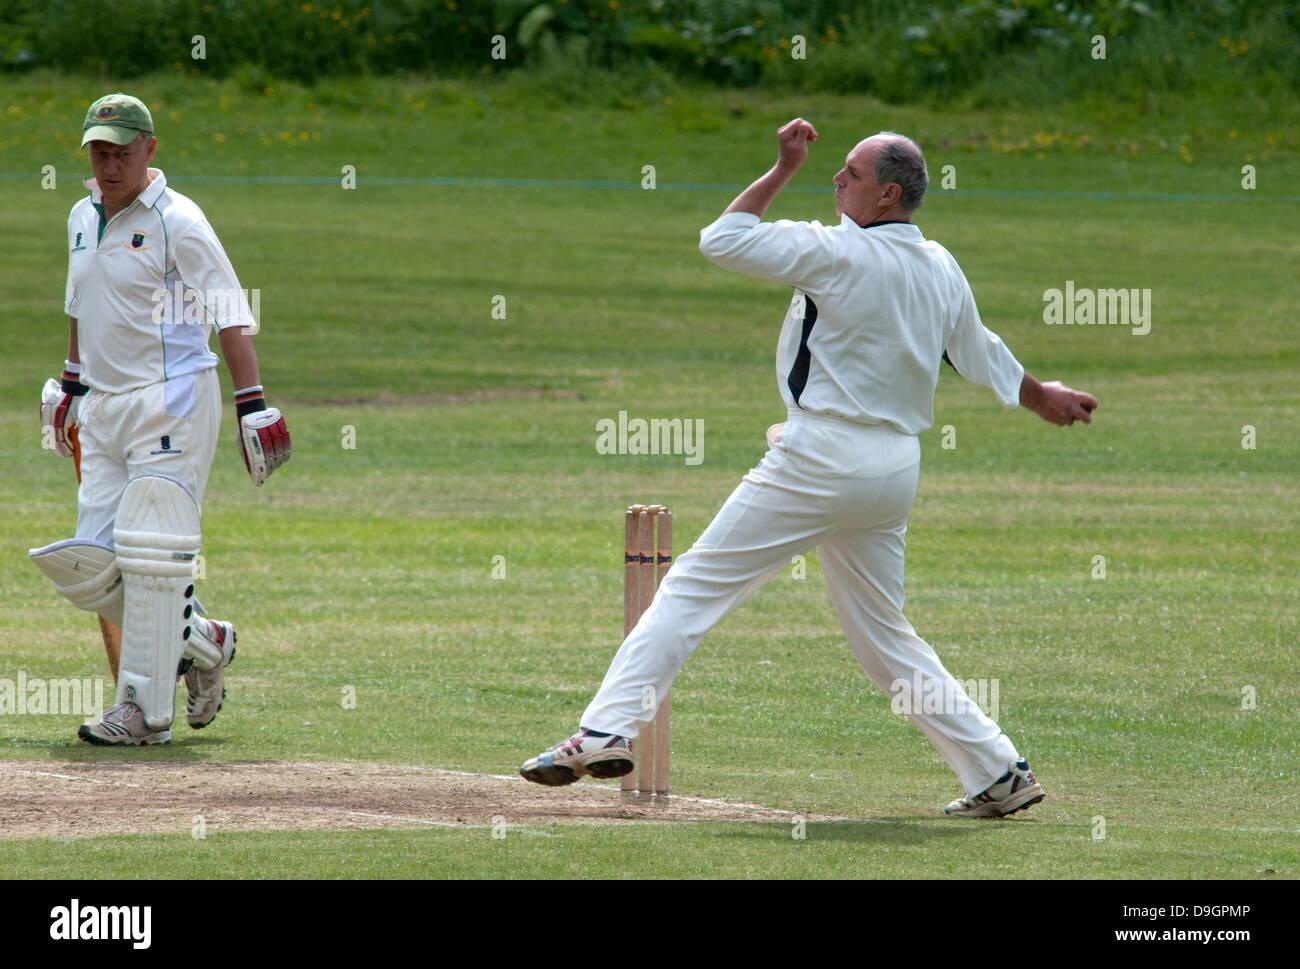 Village cricket at Ashorne, Warwickshire, UK Stock Photo